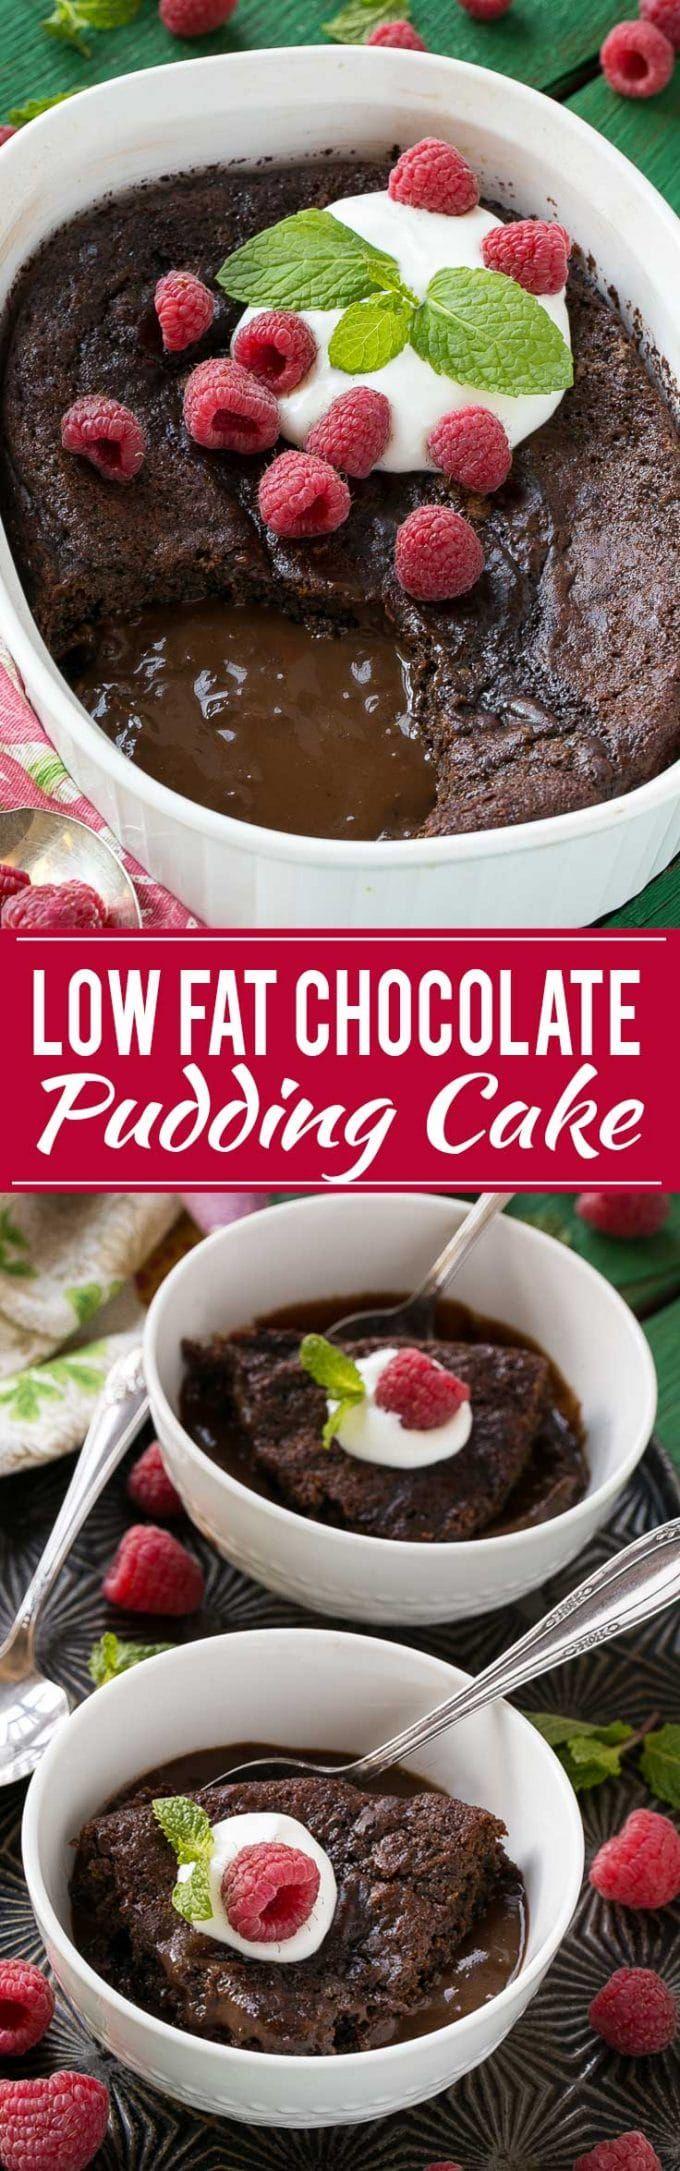 Chocolate Pudding Cake Recipe | Easy Chocolate Pudding Cake Recipe | Low Fat Chocolate Pudding Cake Recipe | Best Chocolate Pudding Cake | Quick Chocolate Pudding Cake